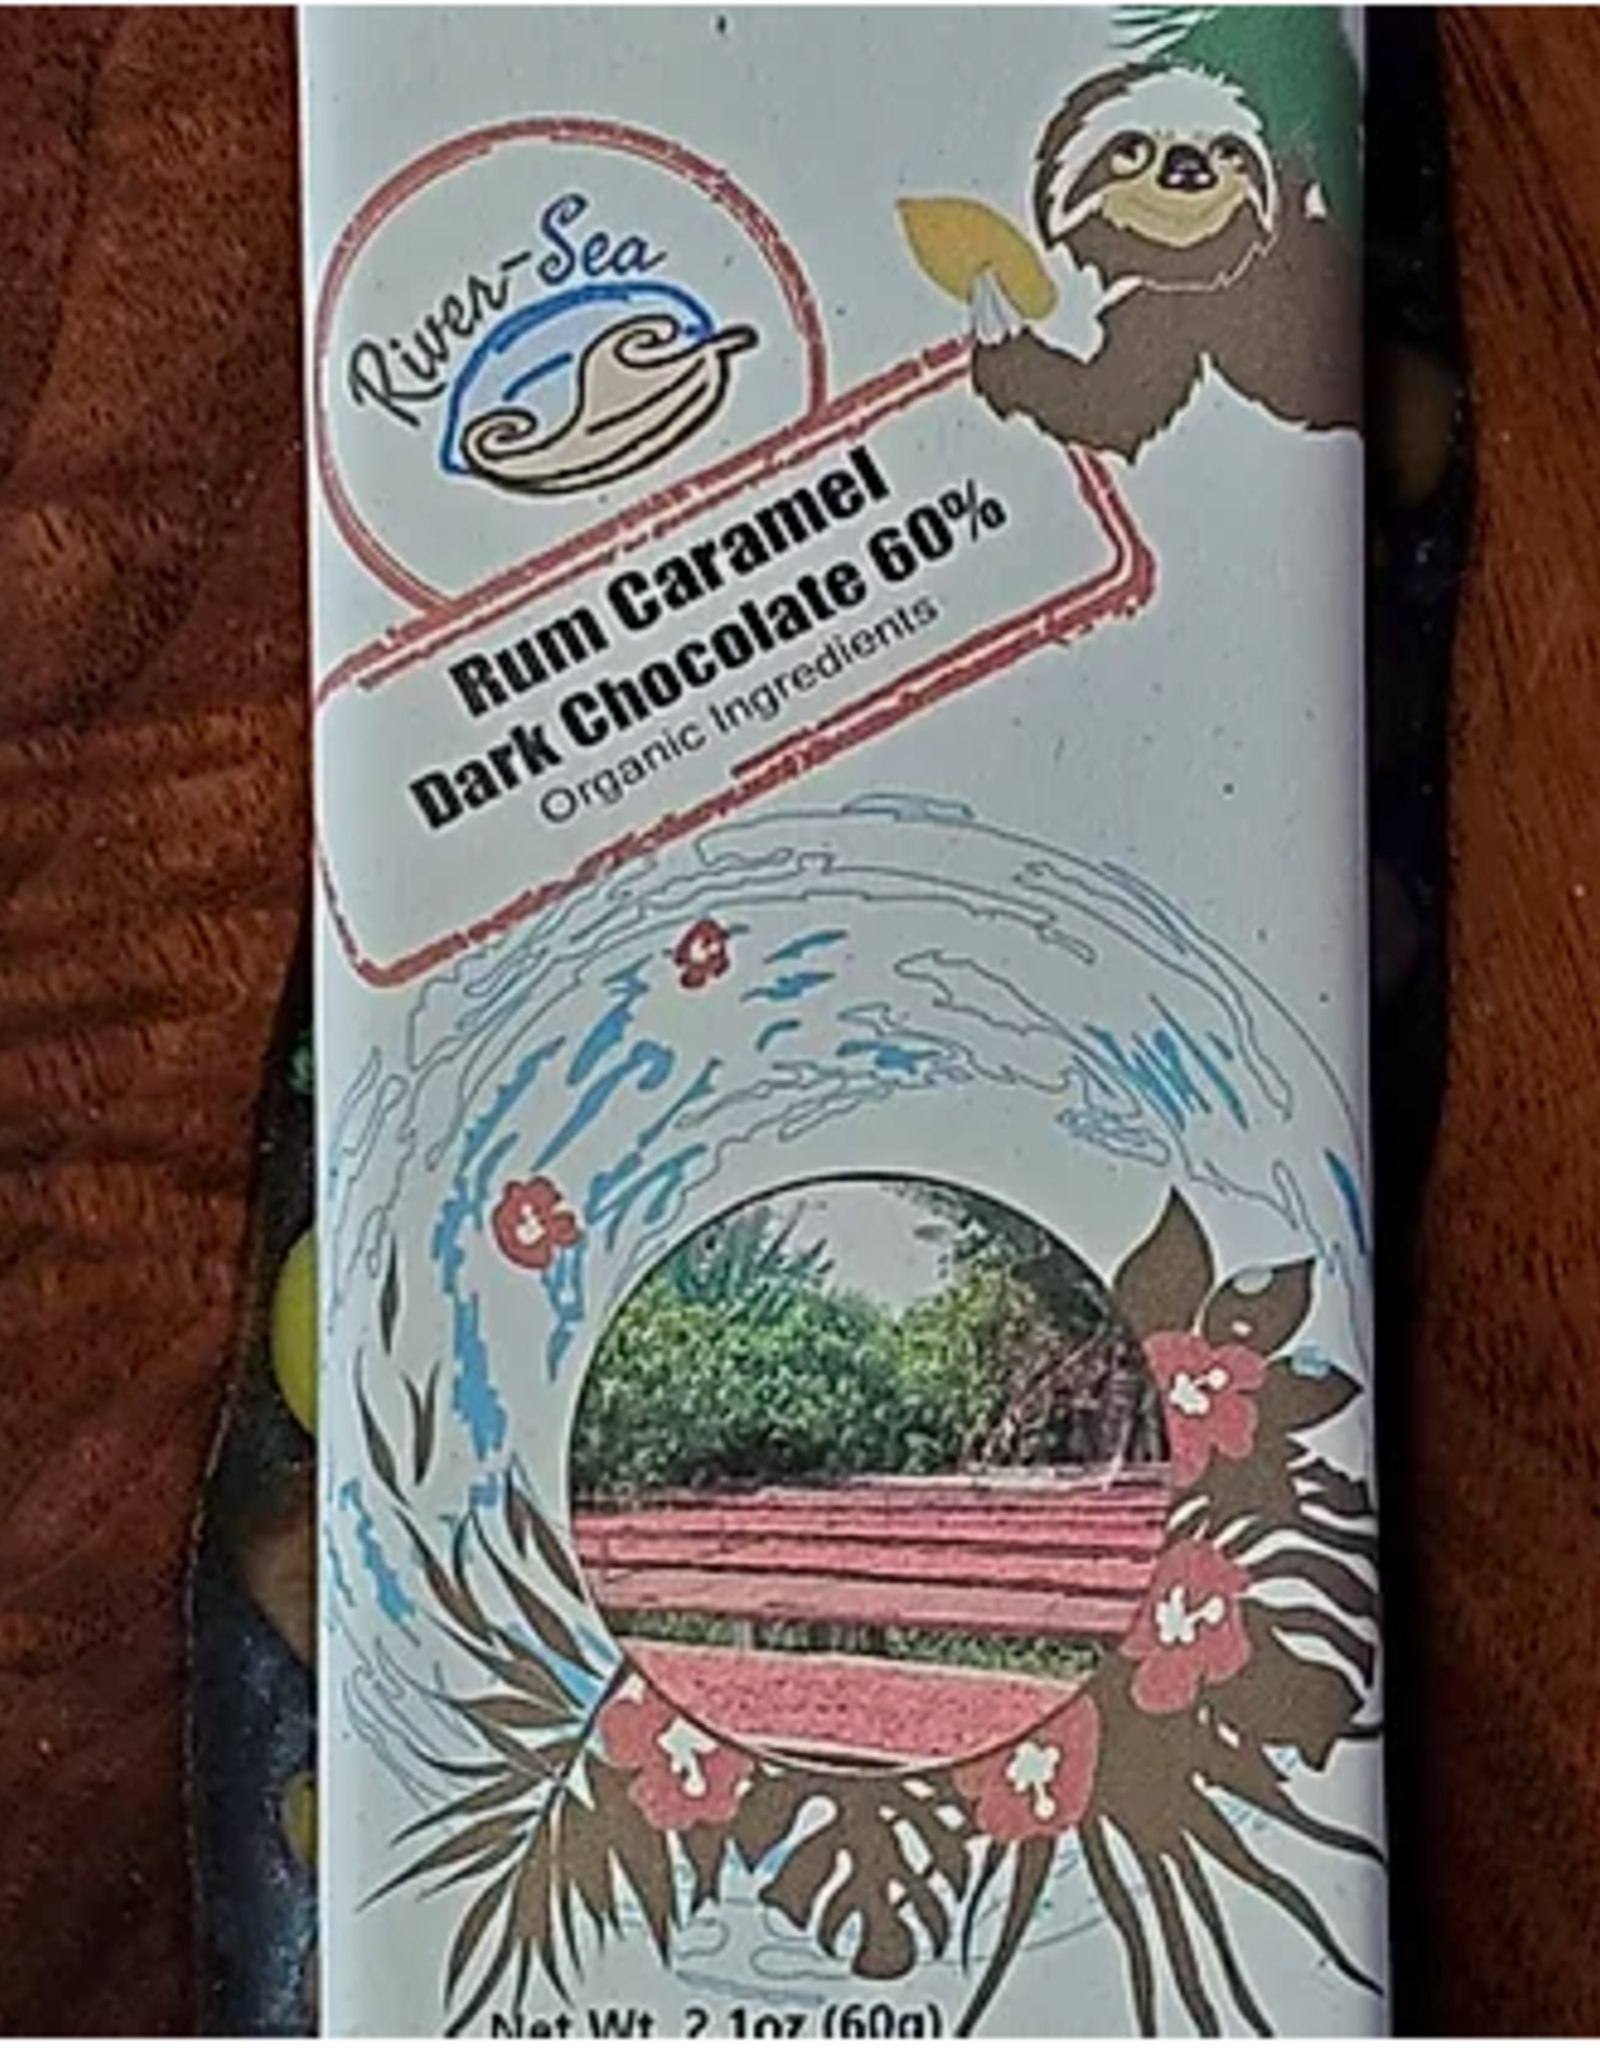 River-Sea Rum Caramel Dark Chocolate, 60%